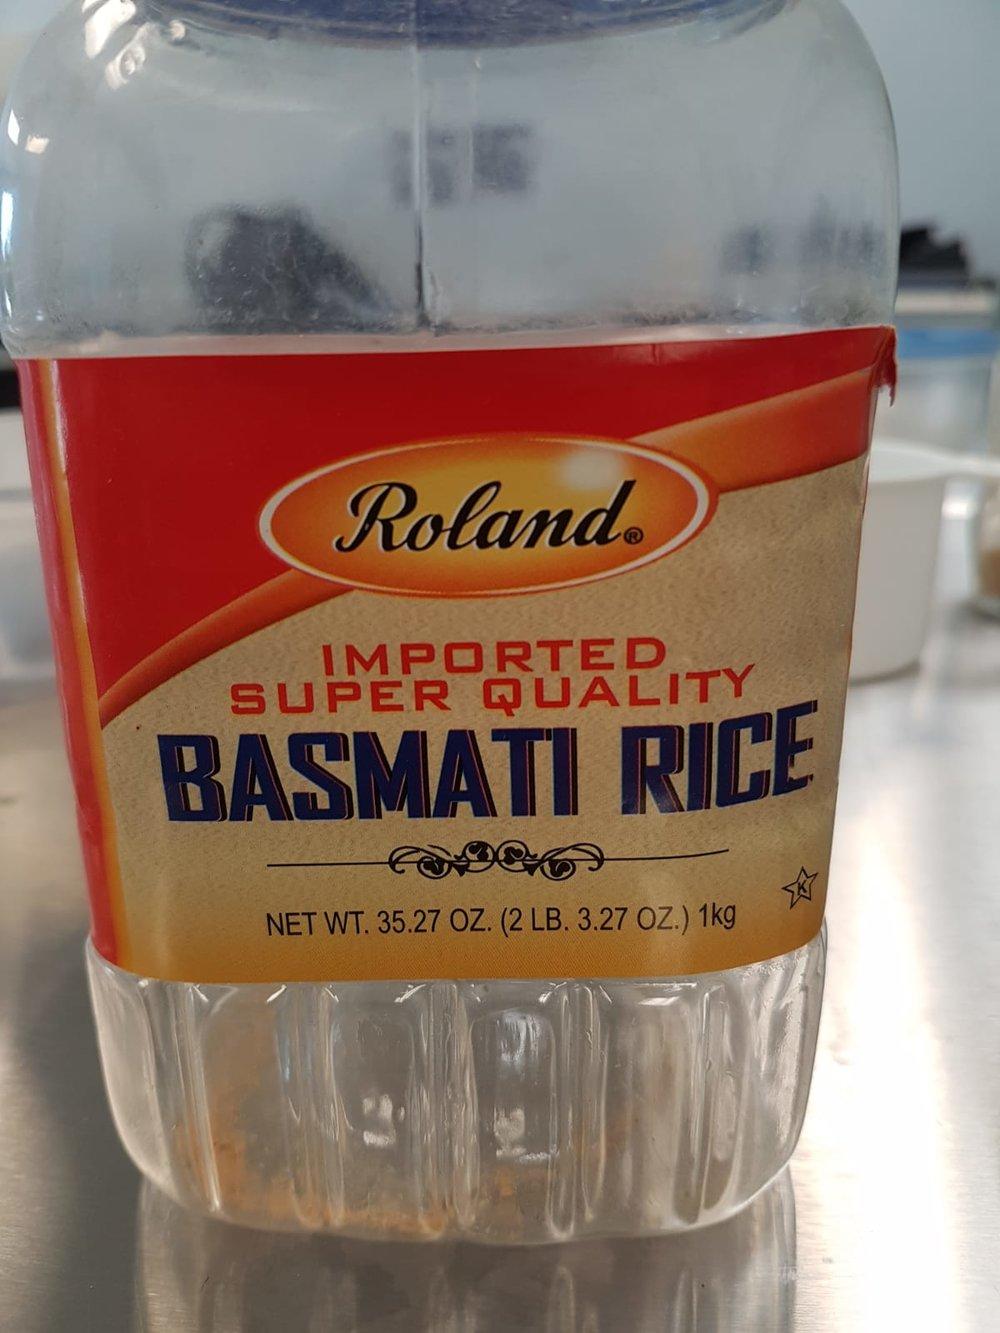 Basmati Rice pic.jpeg